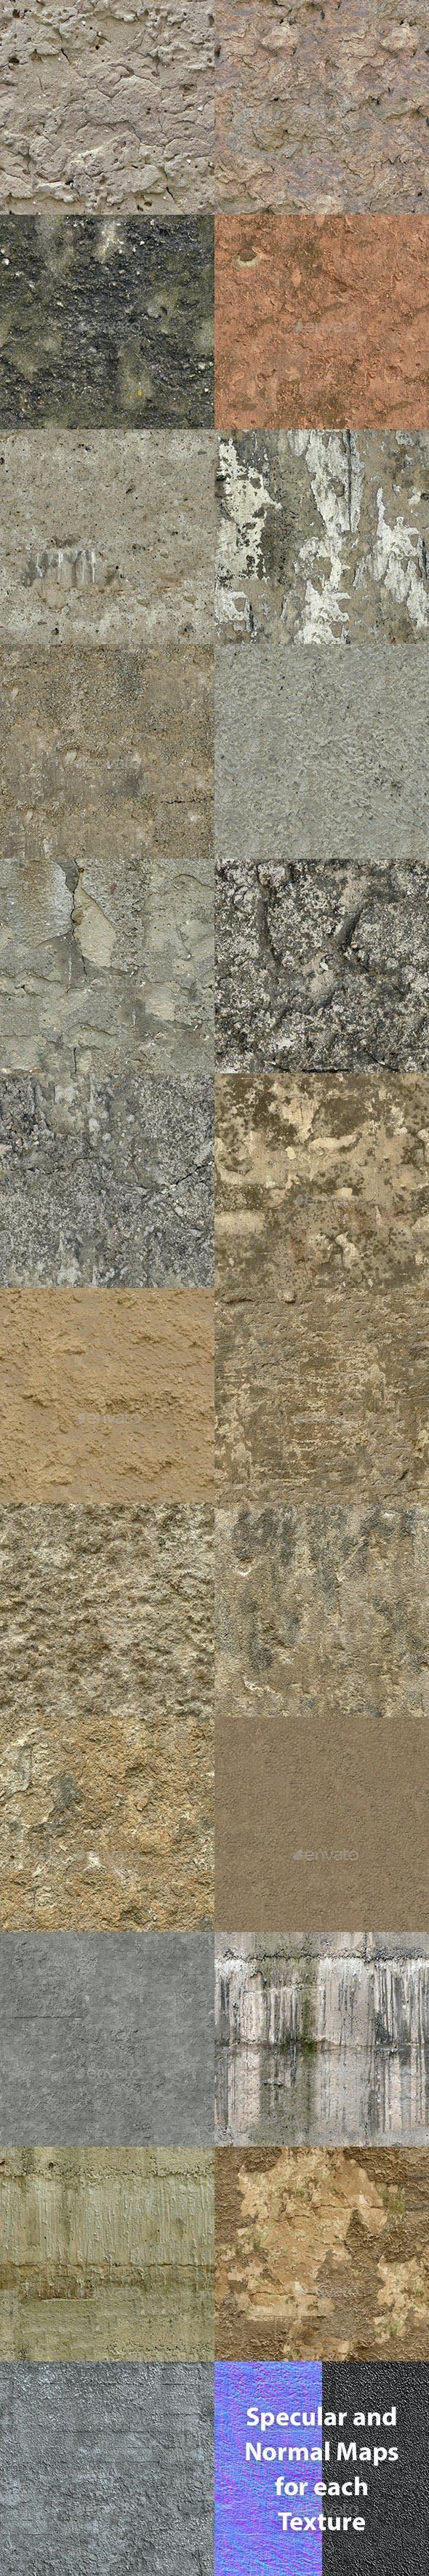 Set of 23 Seamless Rough Concrete Textures Volume 3 - 3DOcean Item for Sale